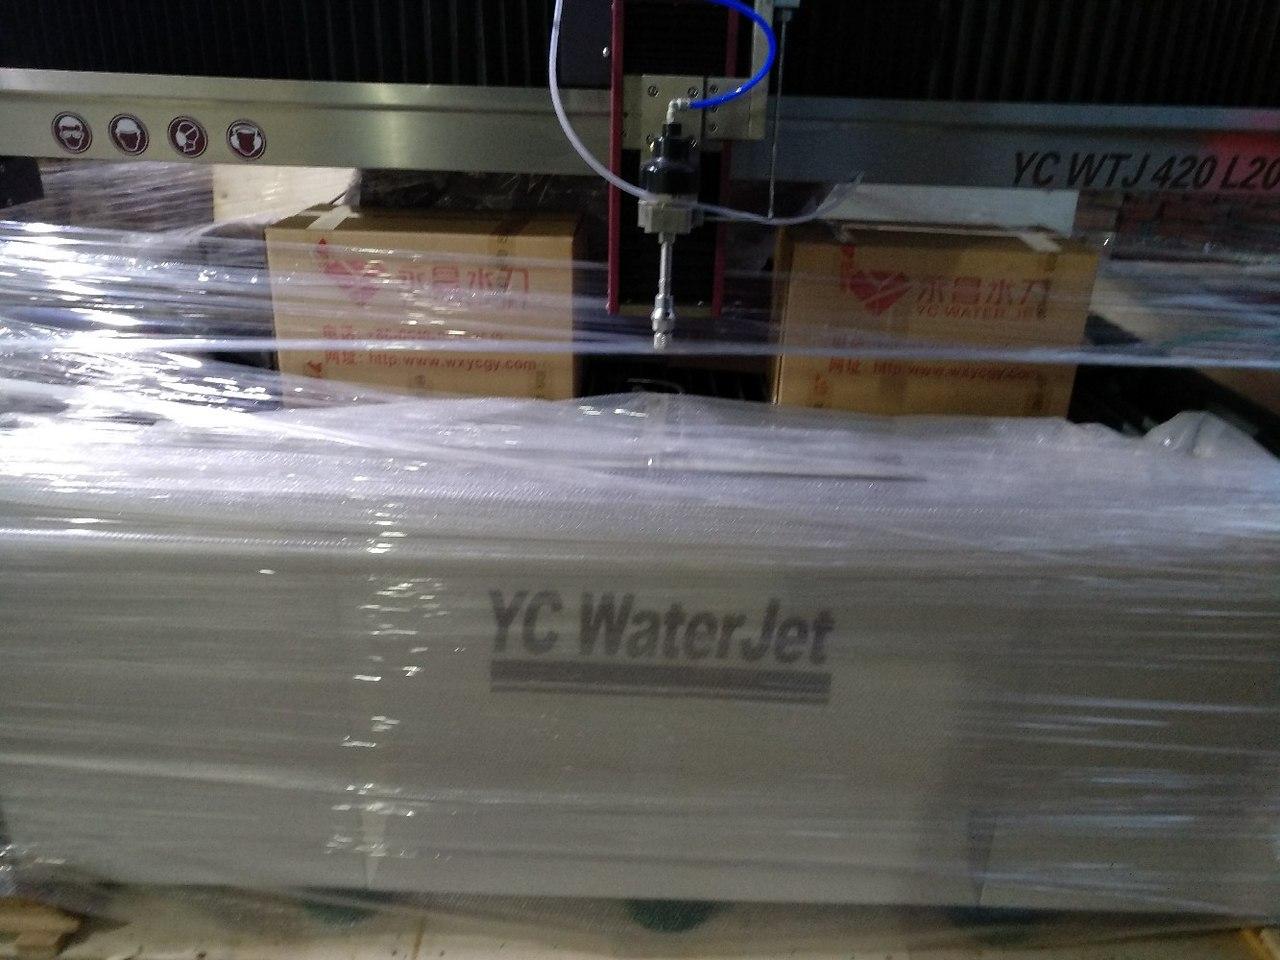 C8CbasA6cuQ - Гидроабразивный станок с ЧПУ YC Waterjet